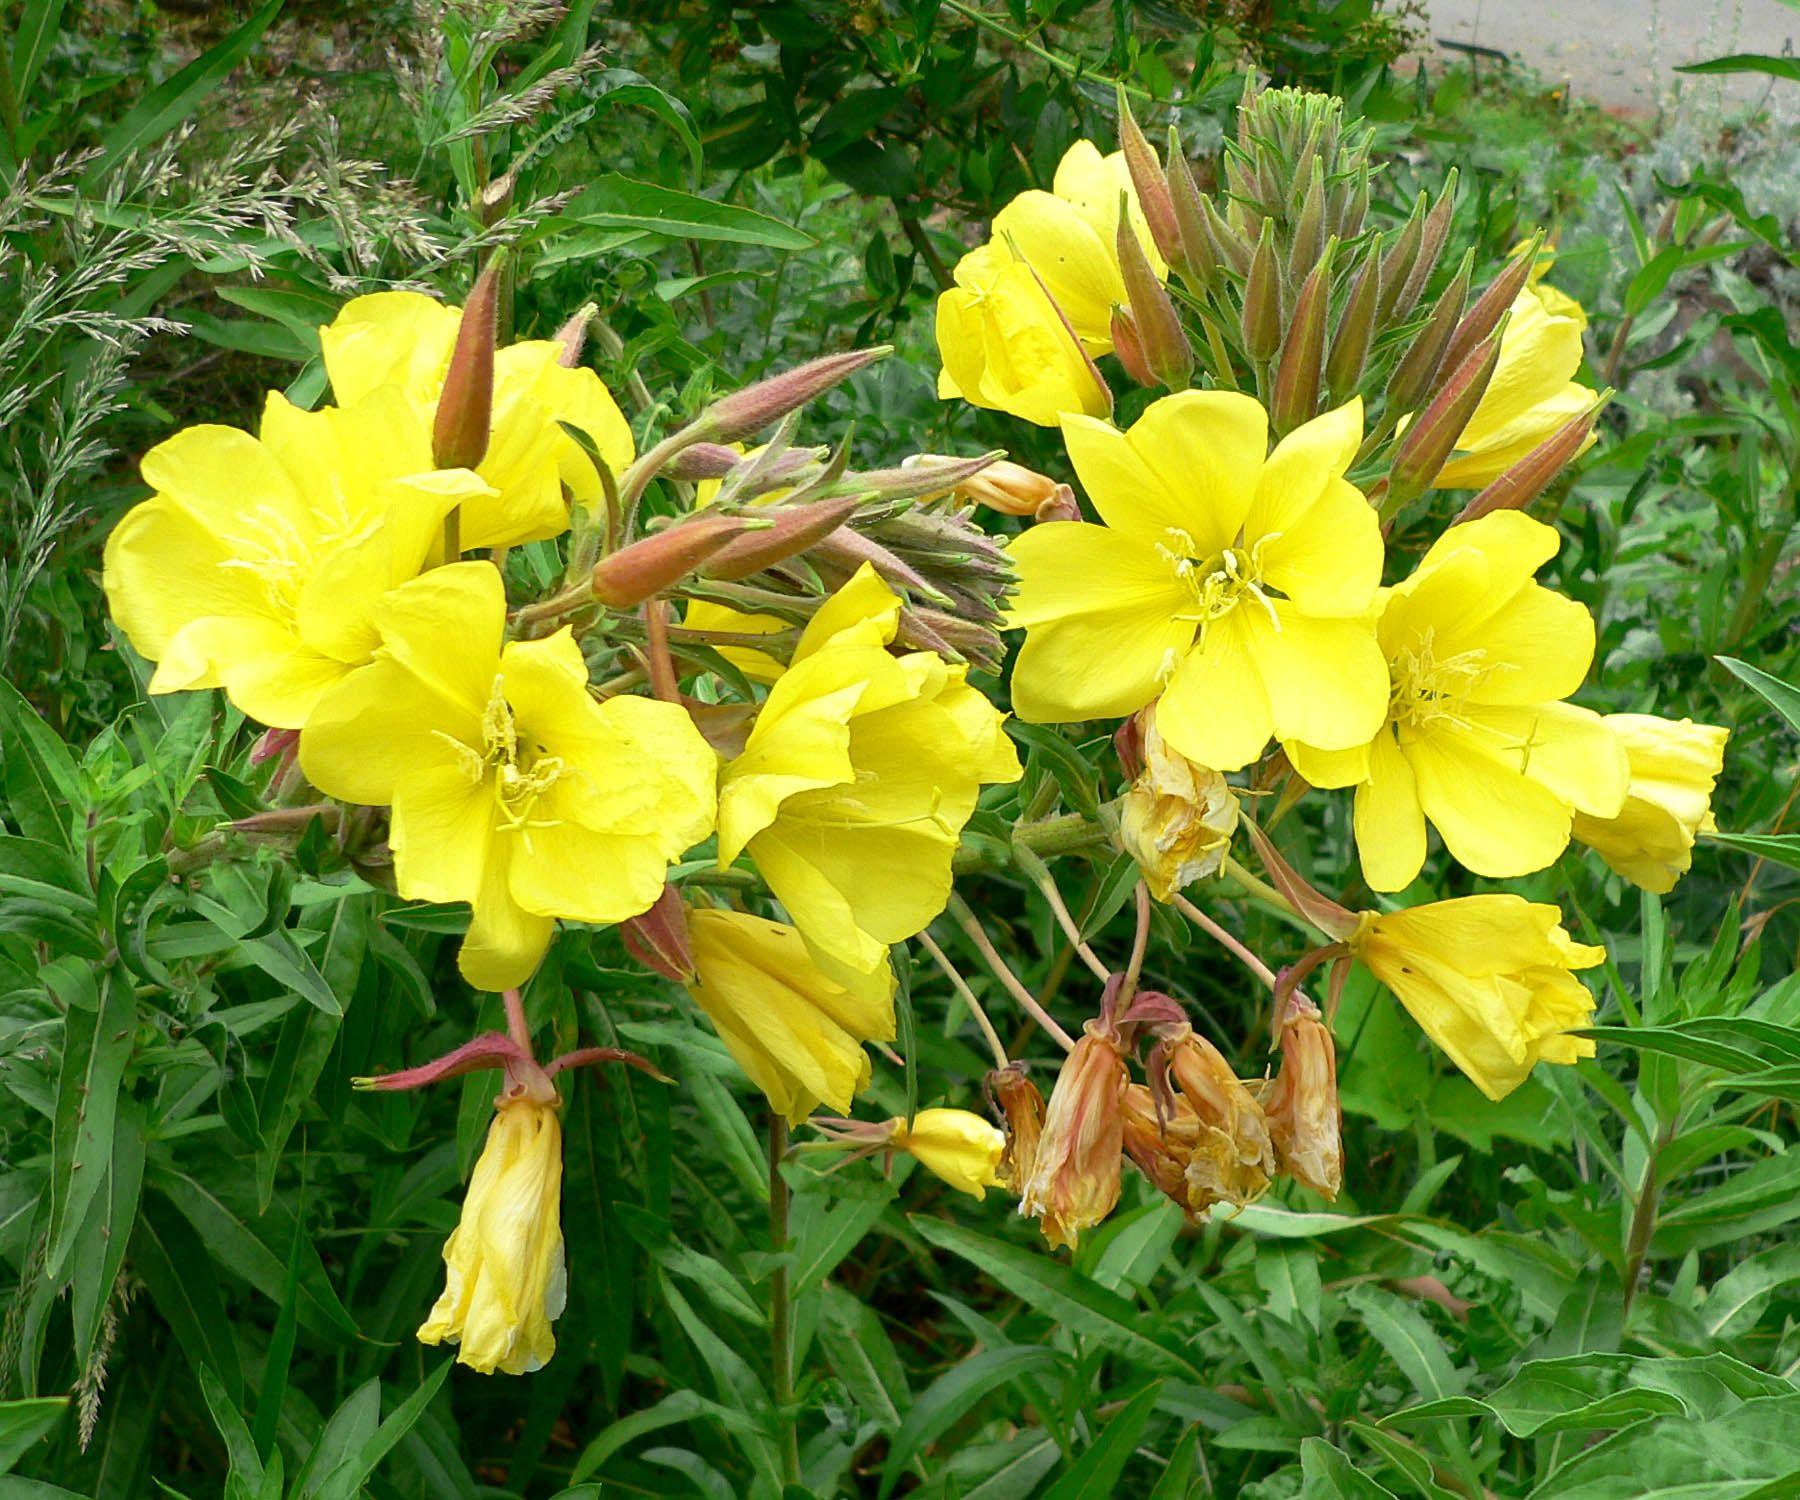 Oenothera Elata Ssp Hookeri  Google Search